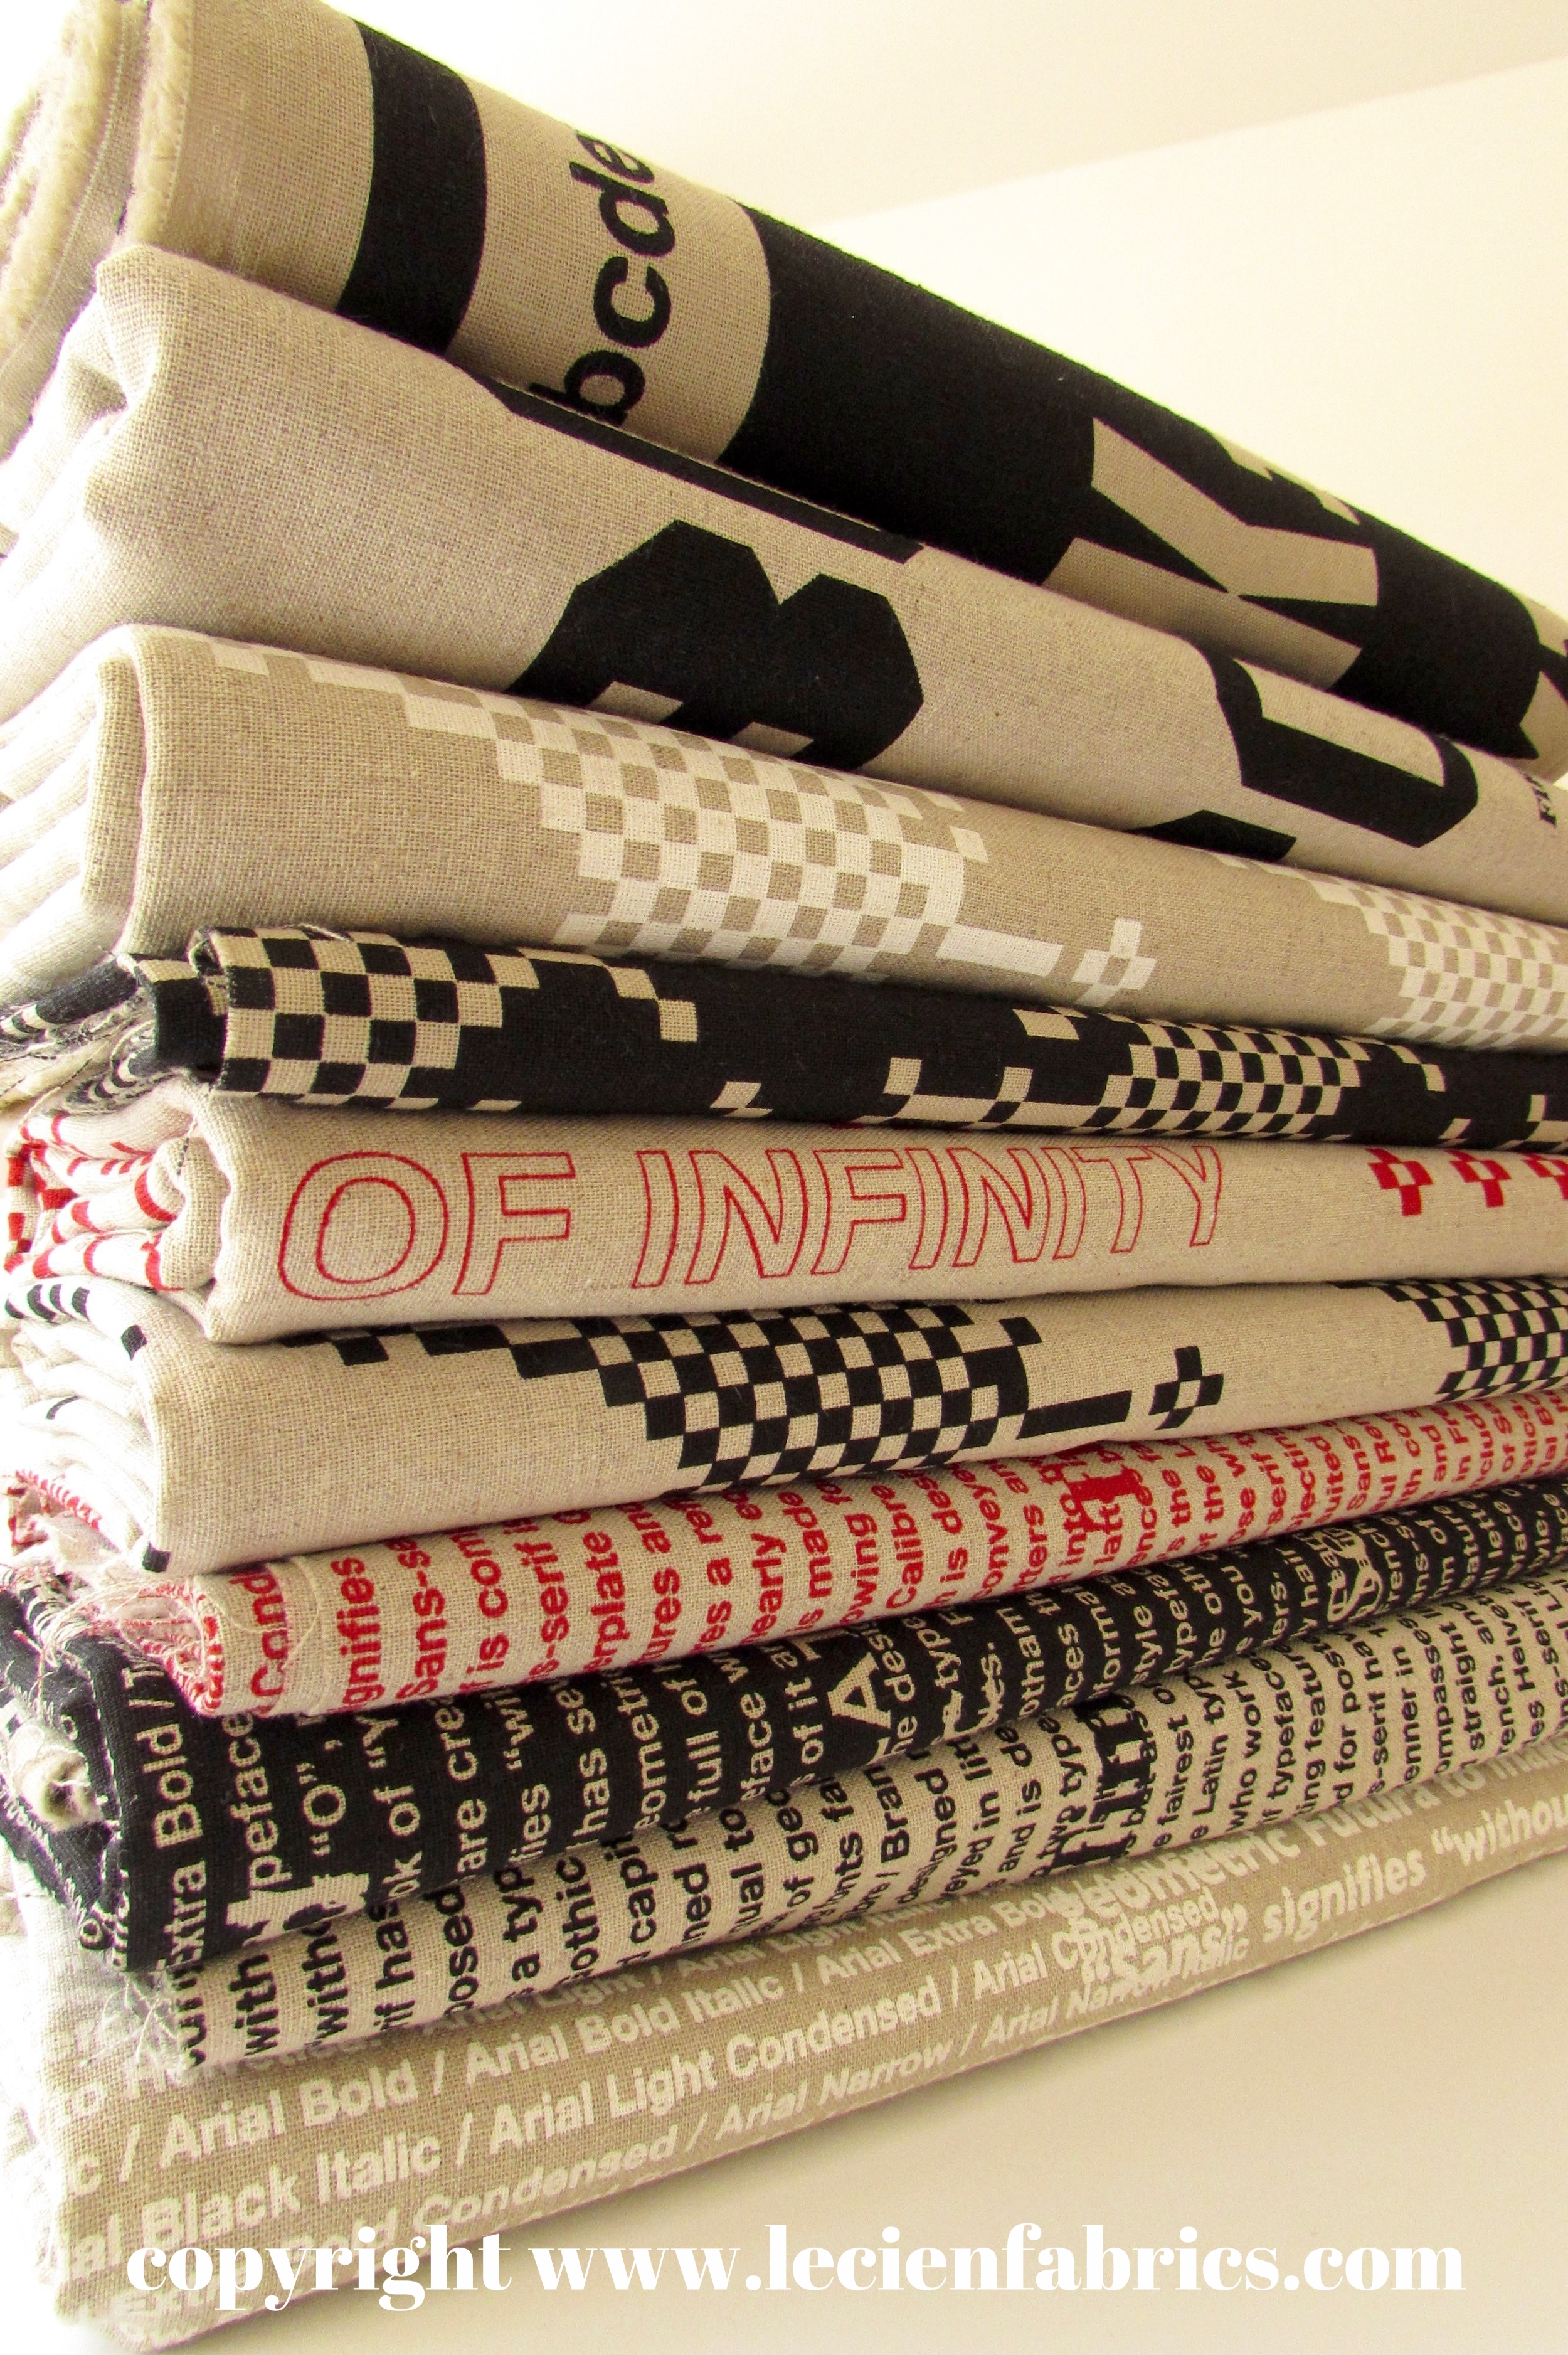 First of Infinity by Kumiko Fujita & Kazue Nakajima Fall 2016  - 55% Linen & 45% Cotton - Delivery December 2016